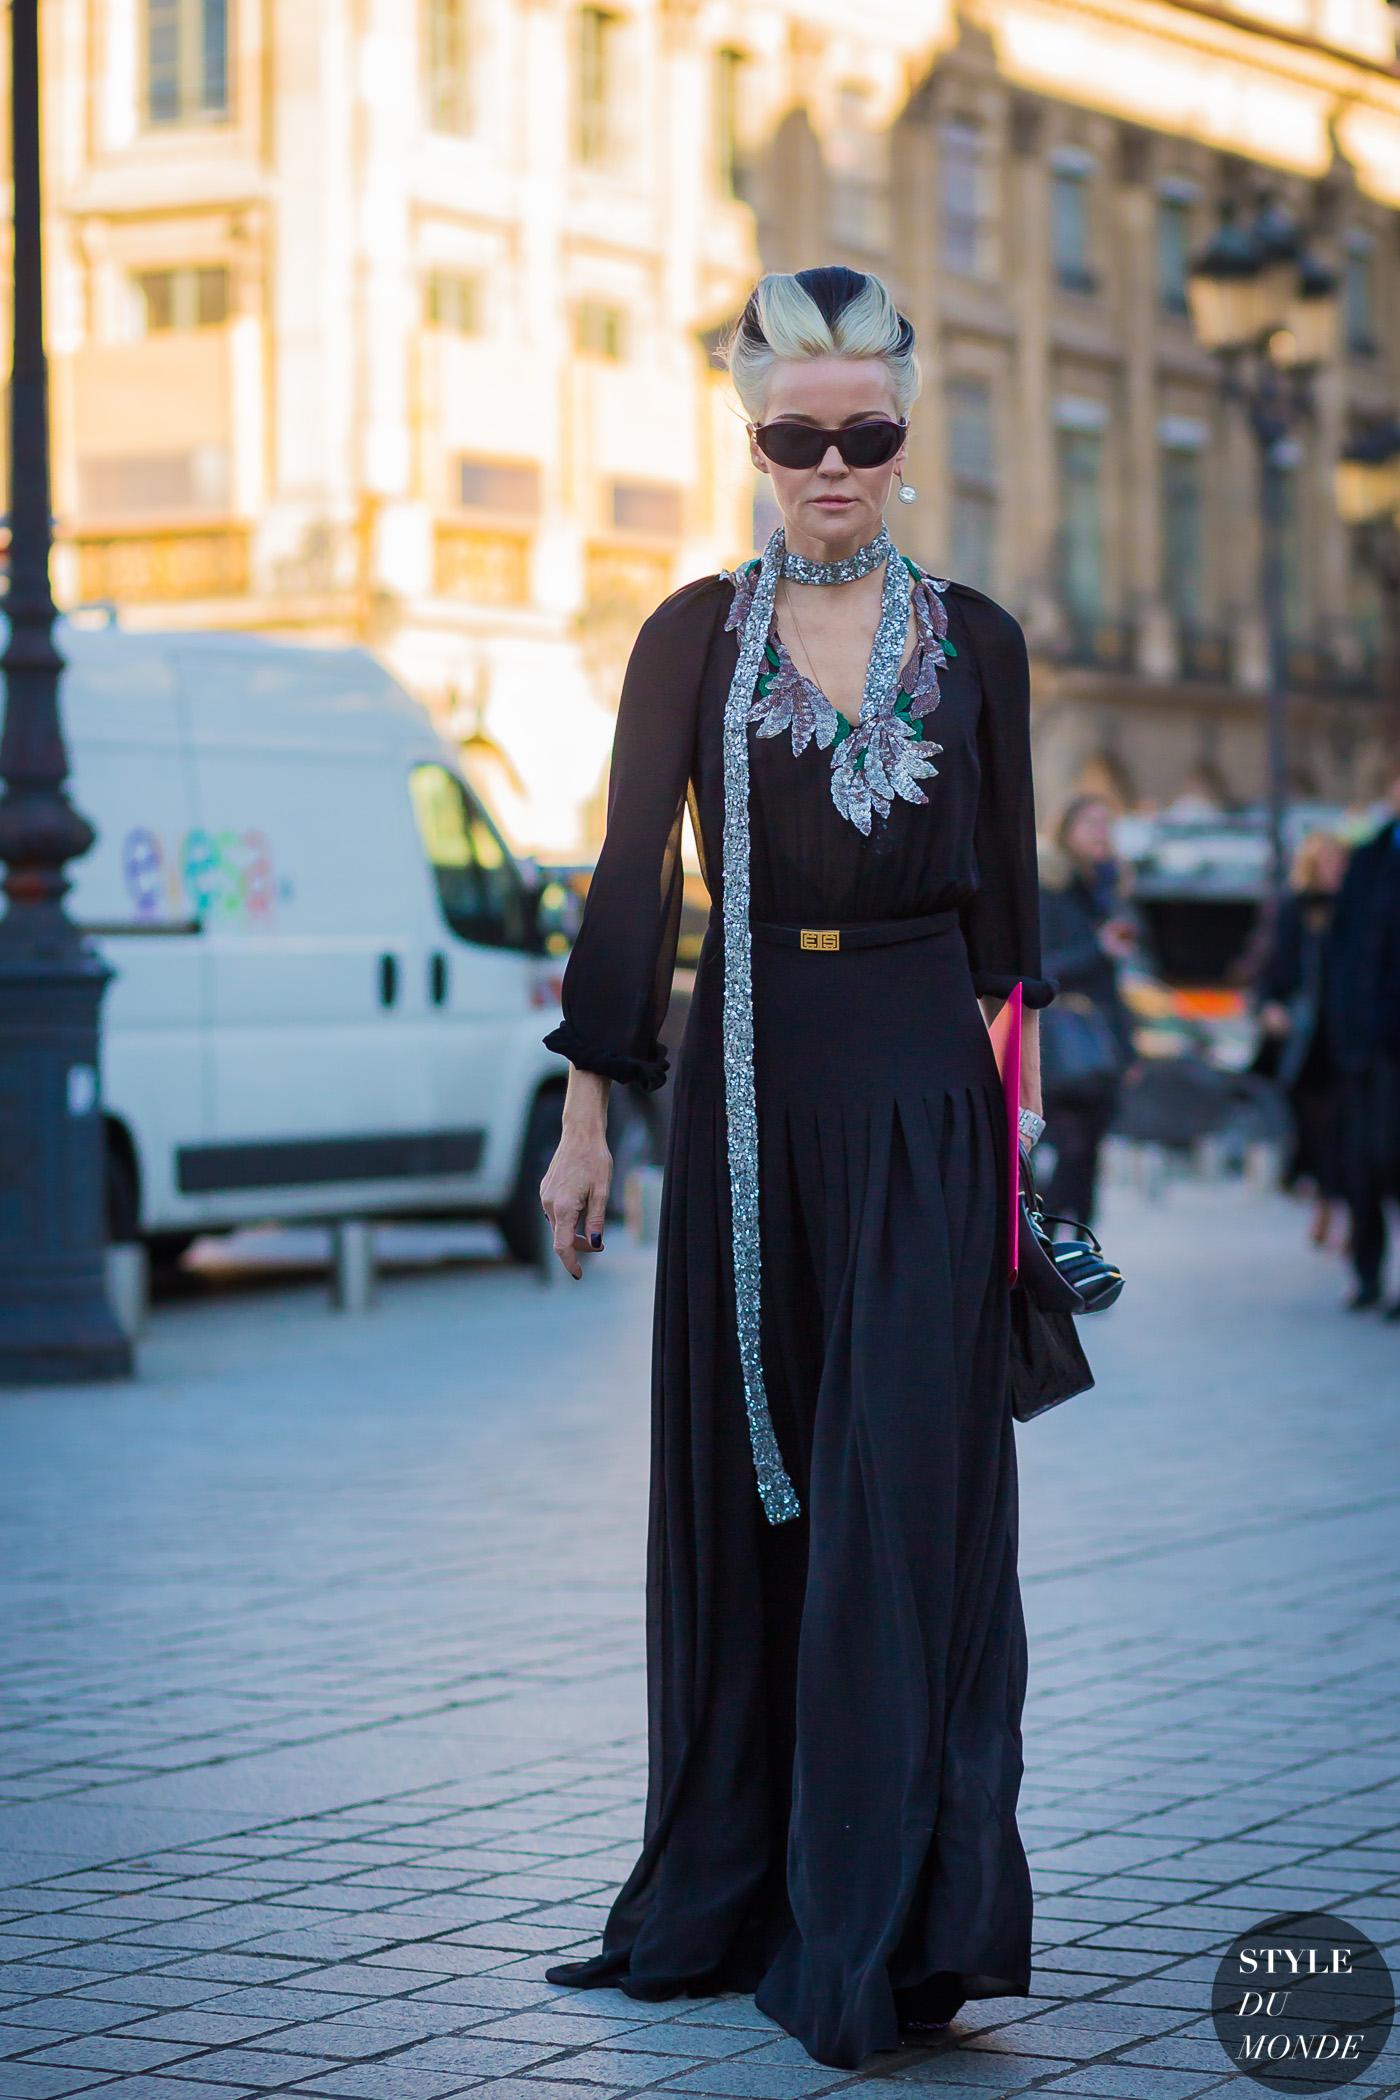 Dress with daphne - 3 part 1